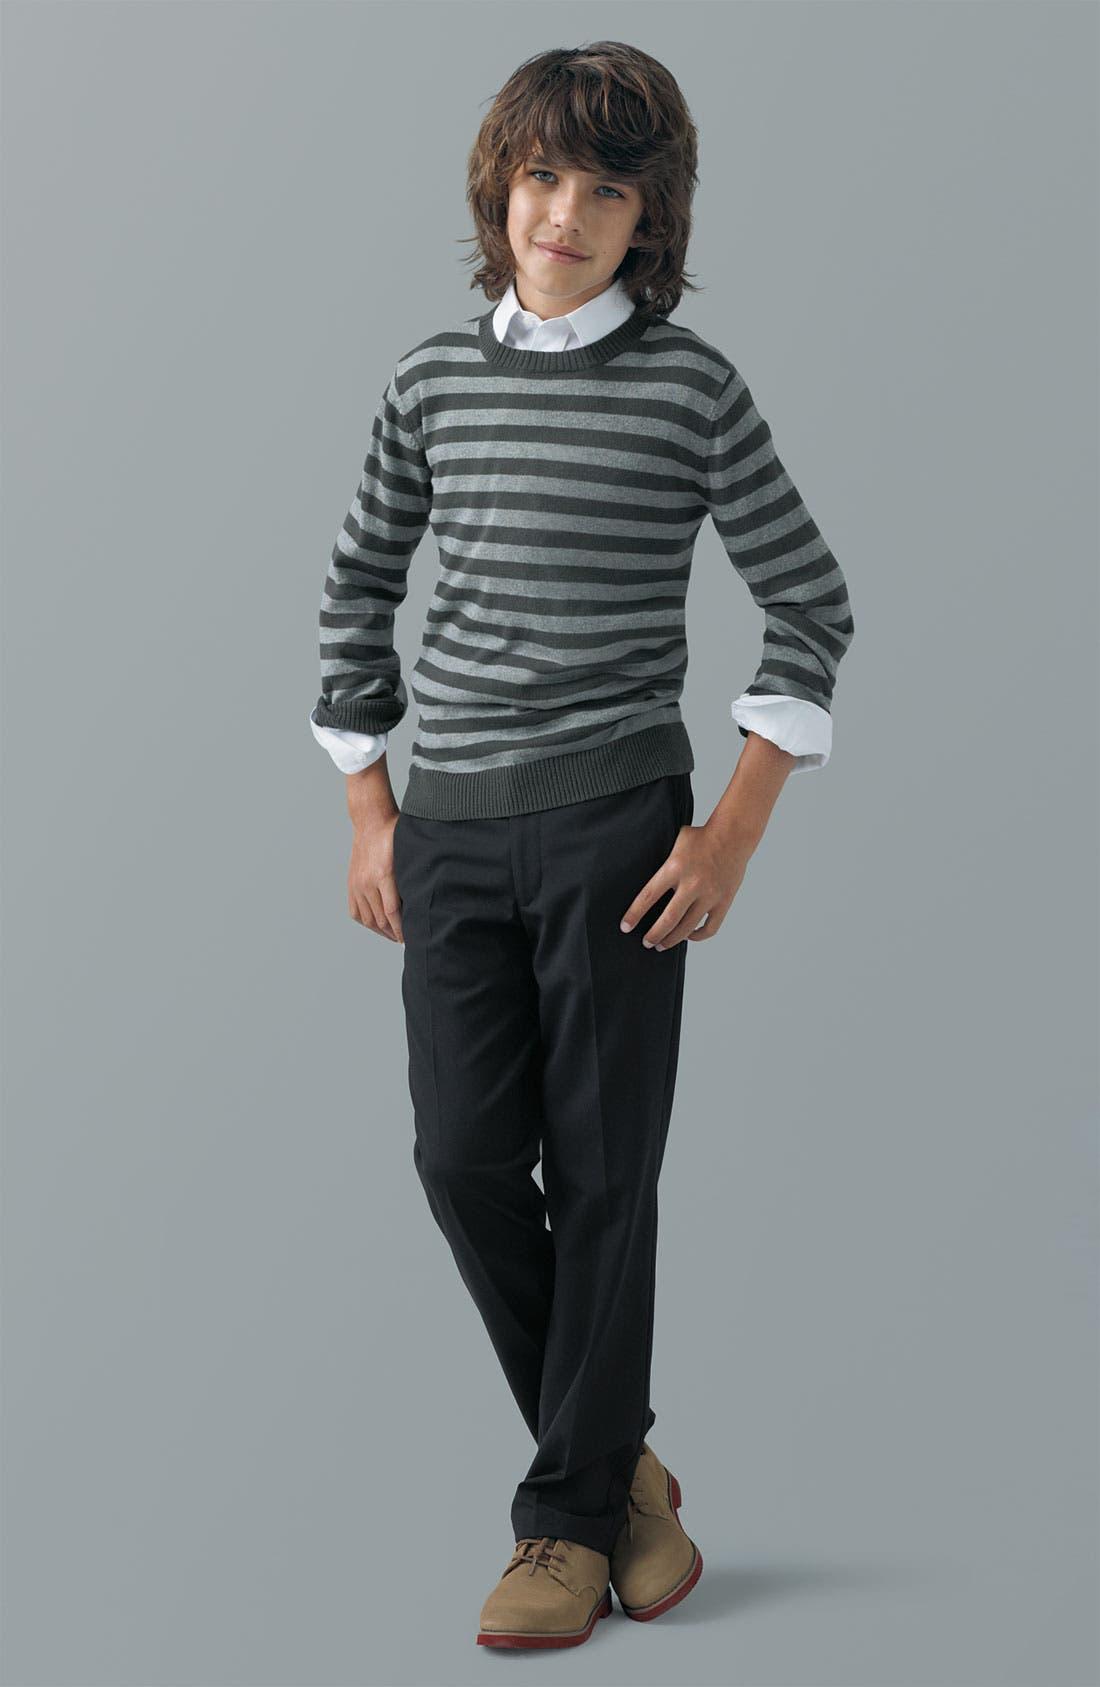 Alternate Image 1 Selected - Tucker + Tate Sweater, Nordstrom Shirt & Joseph Abboud Pants (Little Boys & Big Boys)